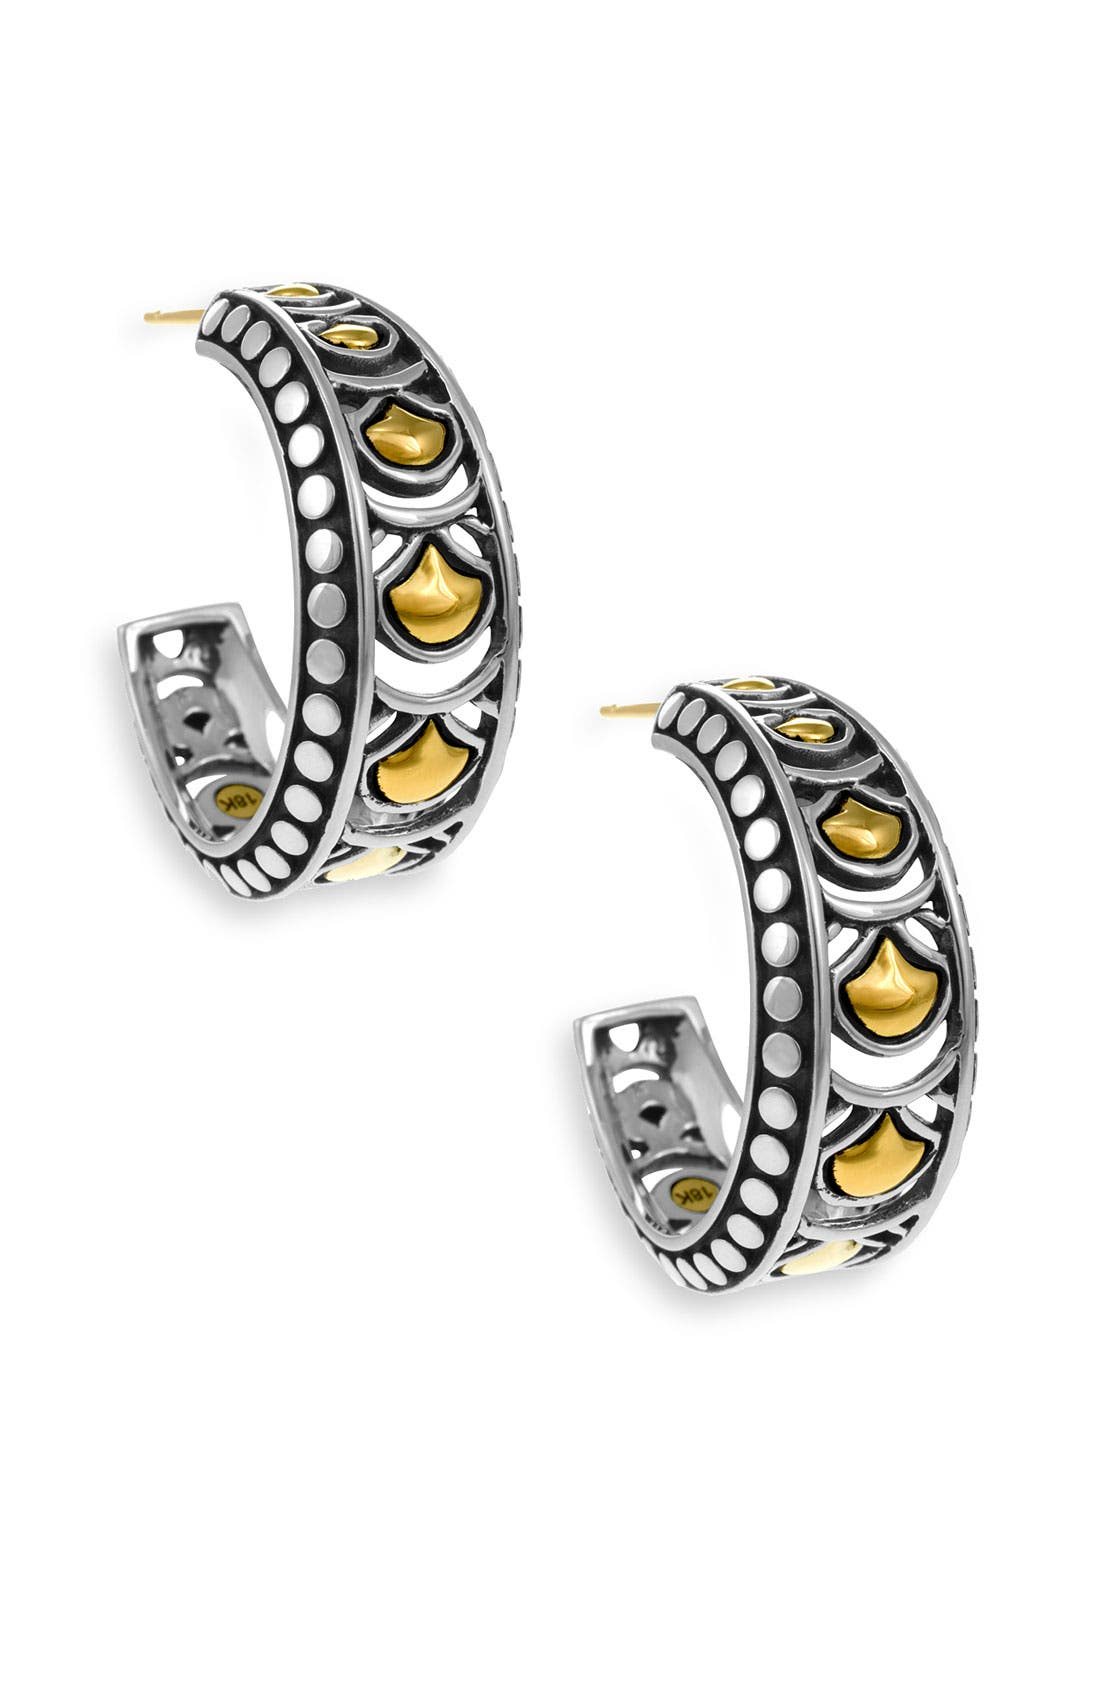 Main Image - John Hardy 'Naga Gold & Silver' Hoop Earrings